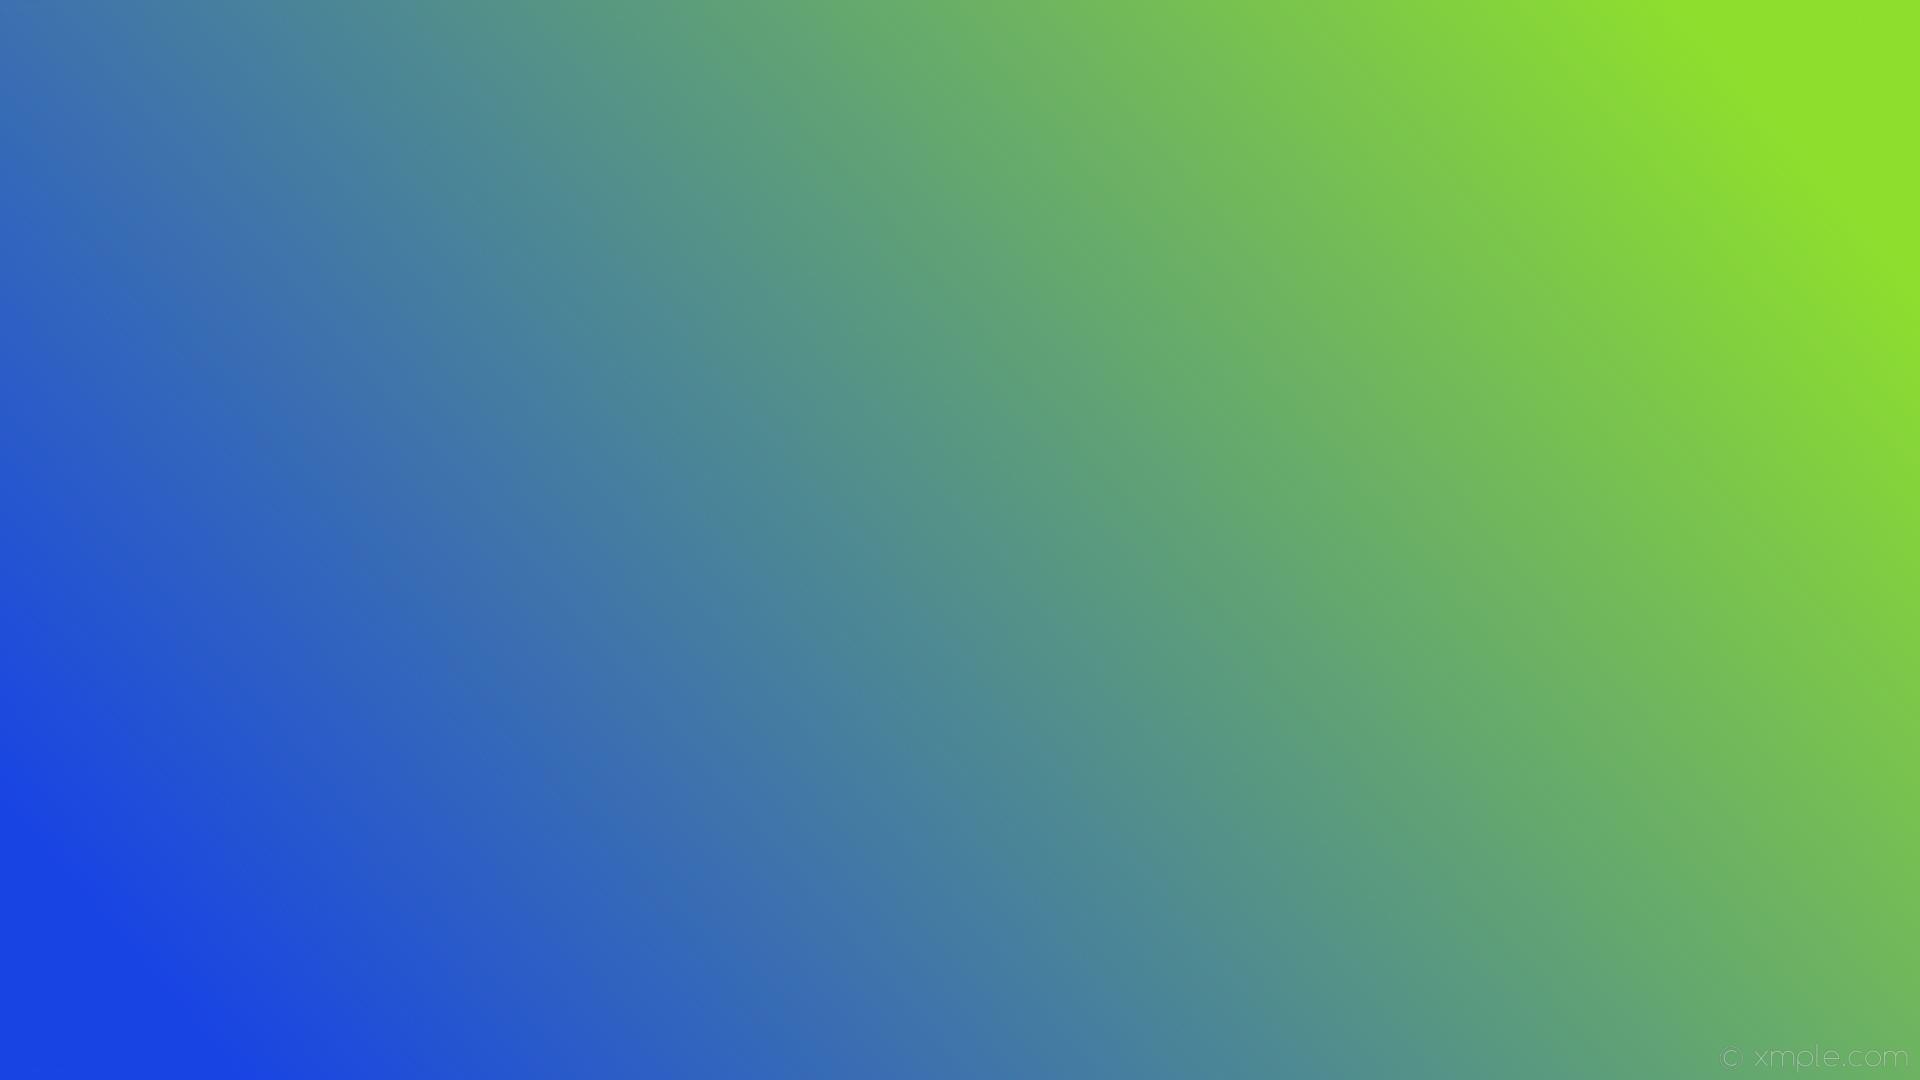 wallpaper lime linear blue gradient #1944e4 #8edf2d 195°